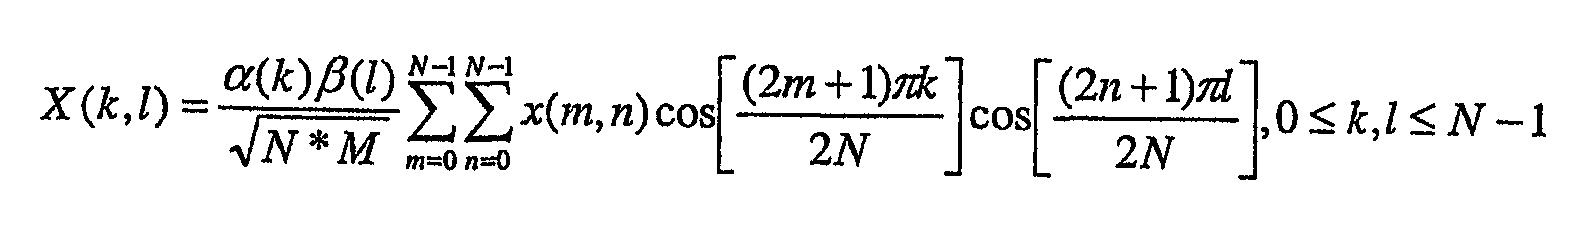 Figure 112007047716286-pct00001